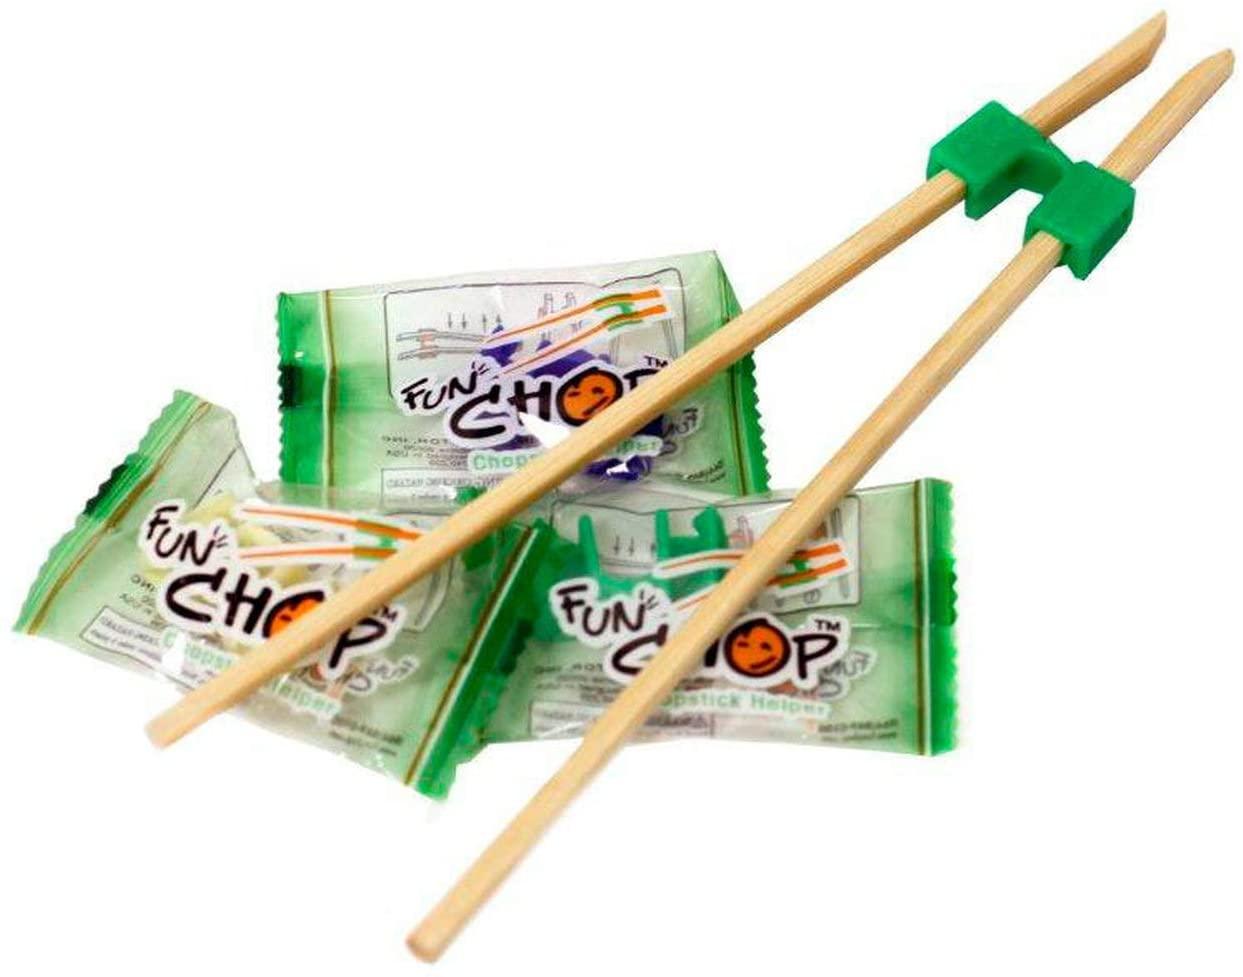 6 FUNCHOP Chopstick Helpers